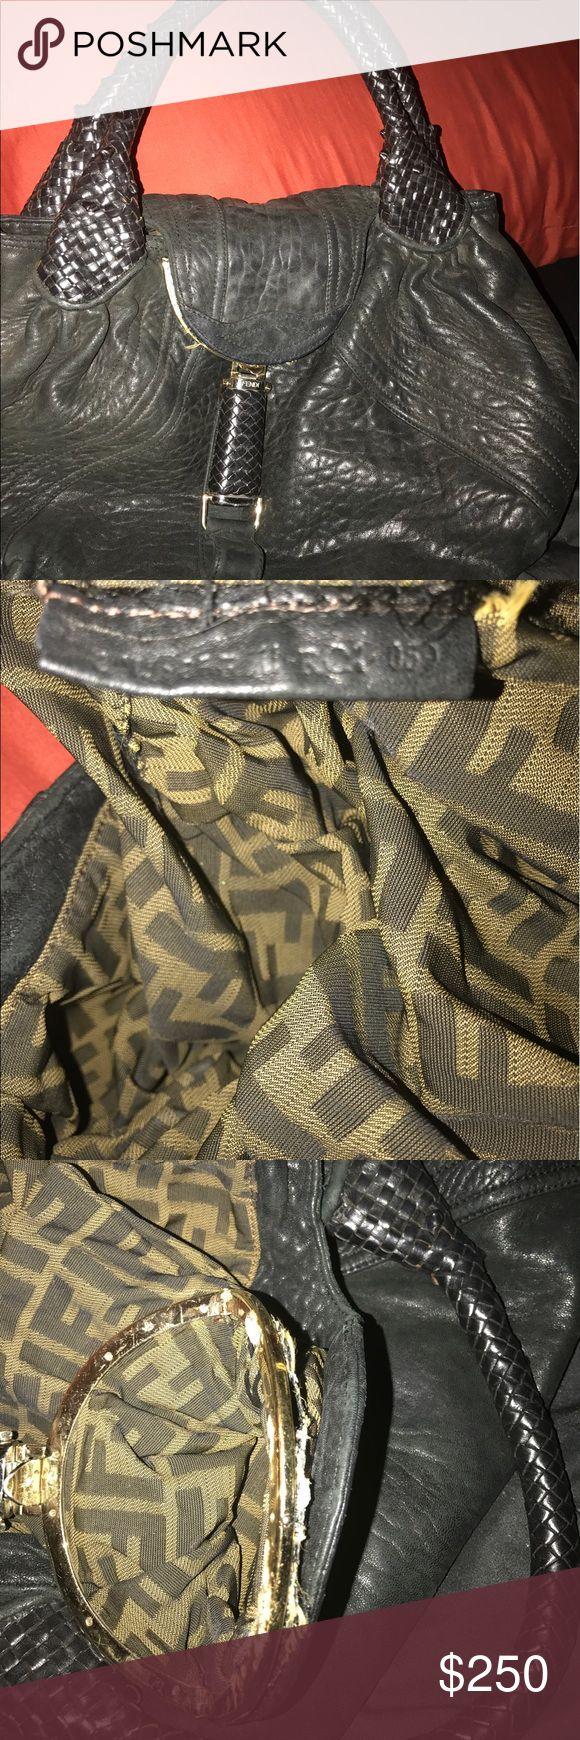 Authentic Fendi bag Black Fendi Spy bag.  Secret compartment came a loose sink glued it back together.  Bag still has lots of life in it. Fendi Bags Satchels